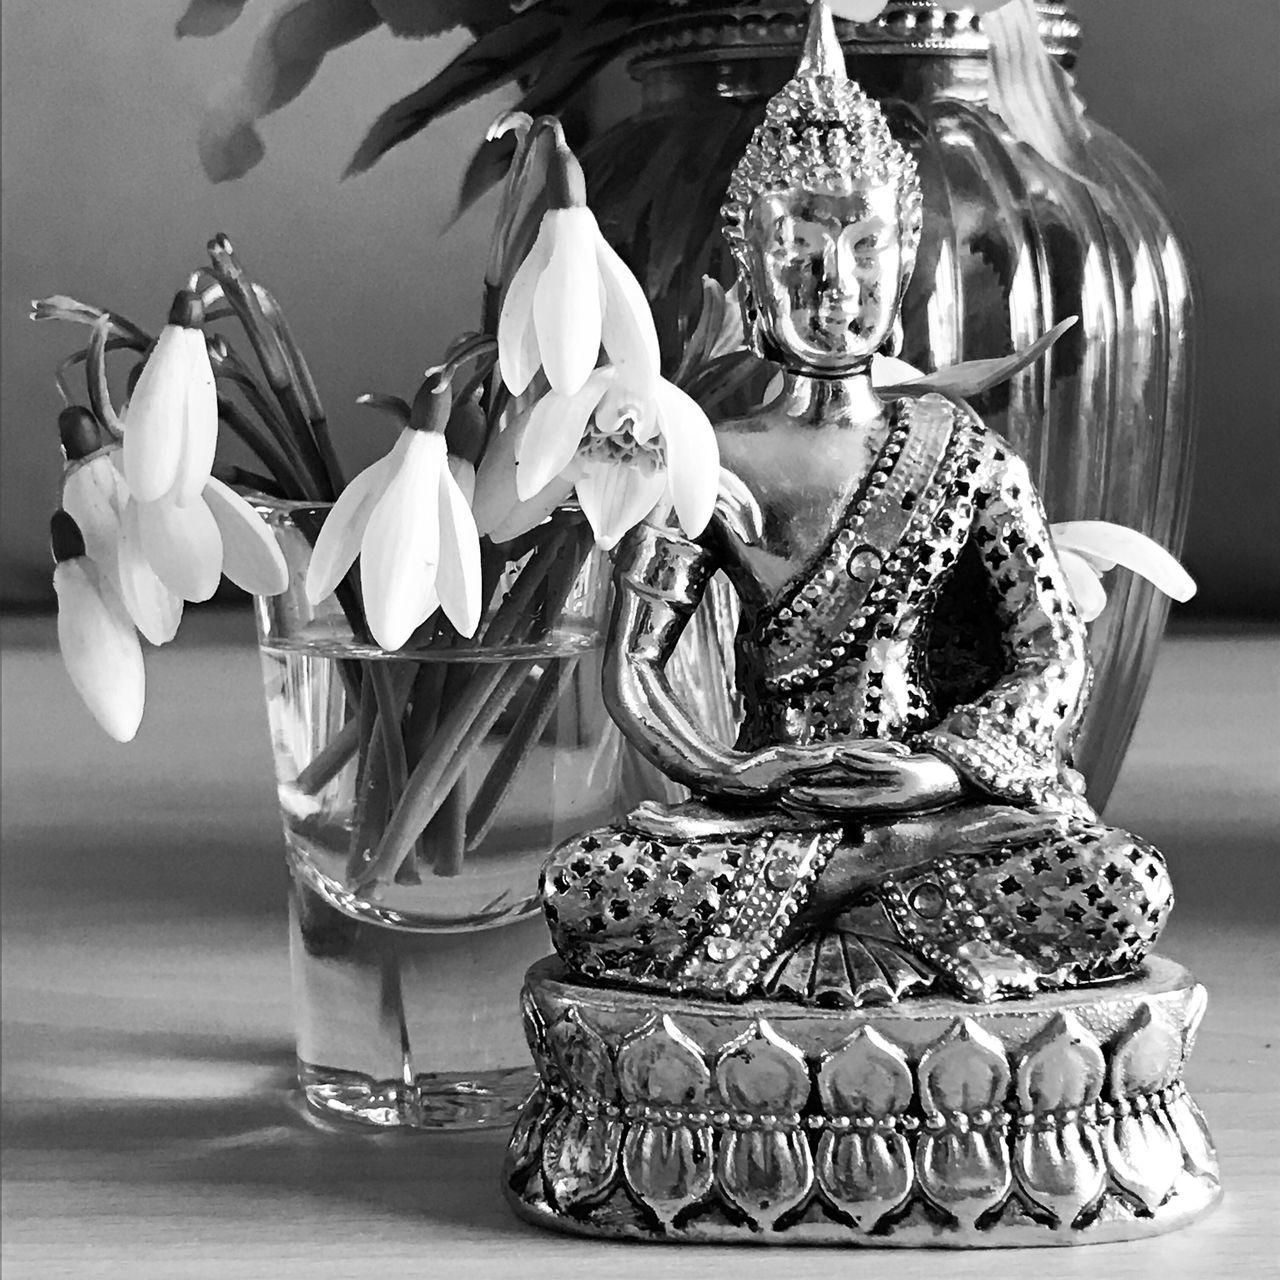 indoors, no people, vase, flower, close-up, food, freshness, day